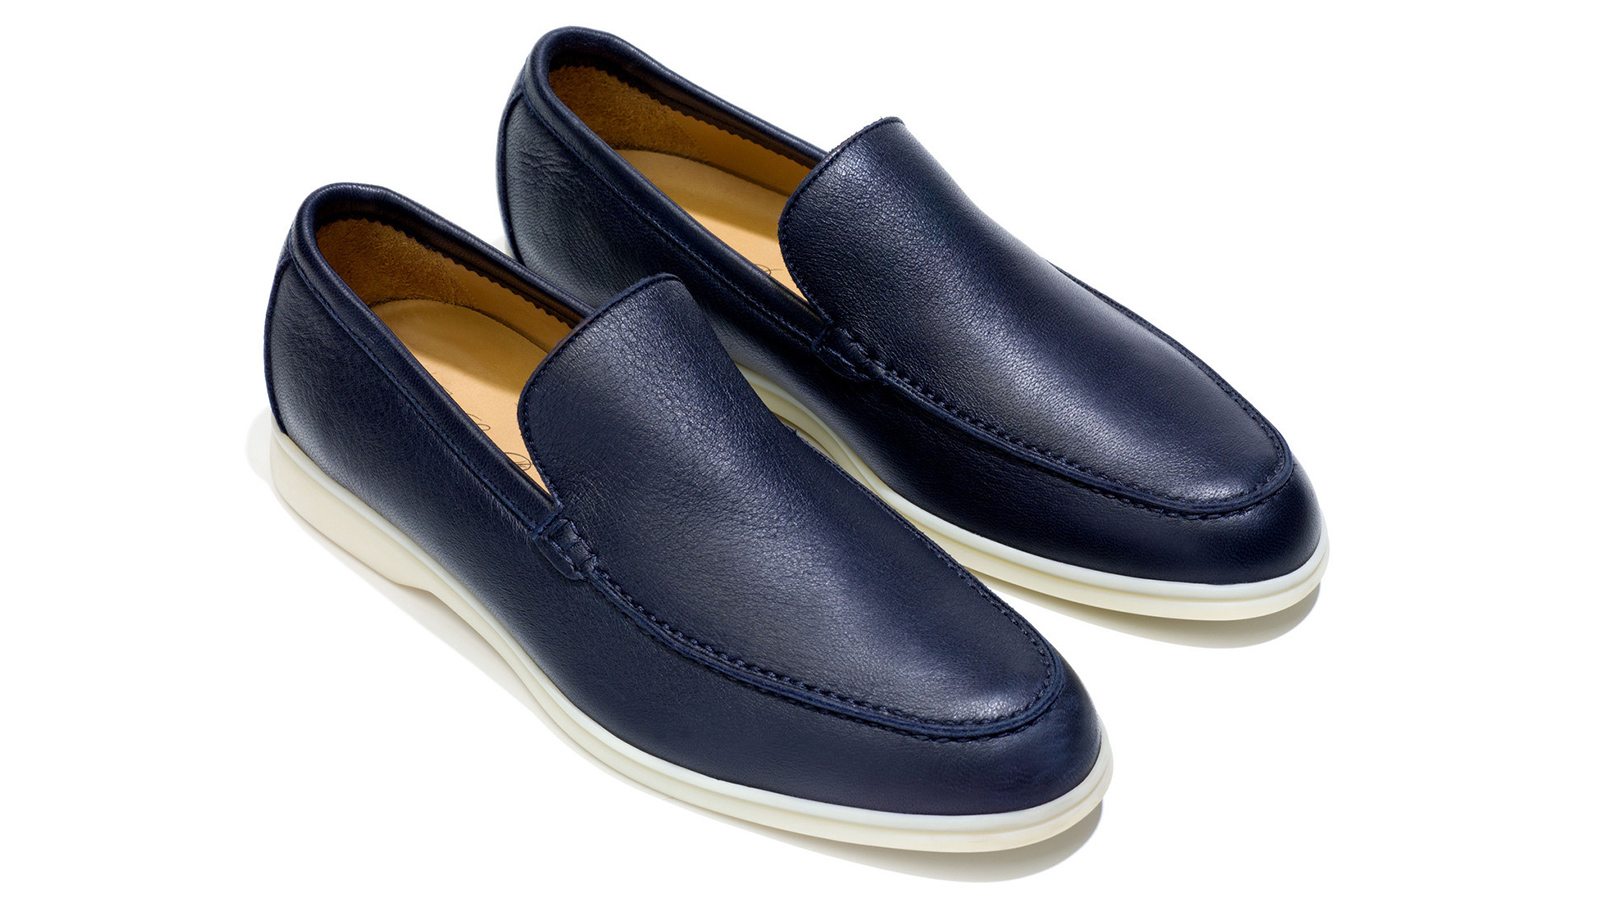 Best Men's Boat Shoes 2020 | Boat